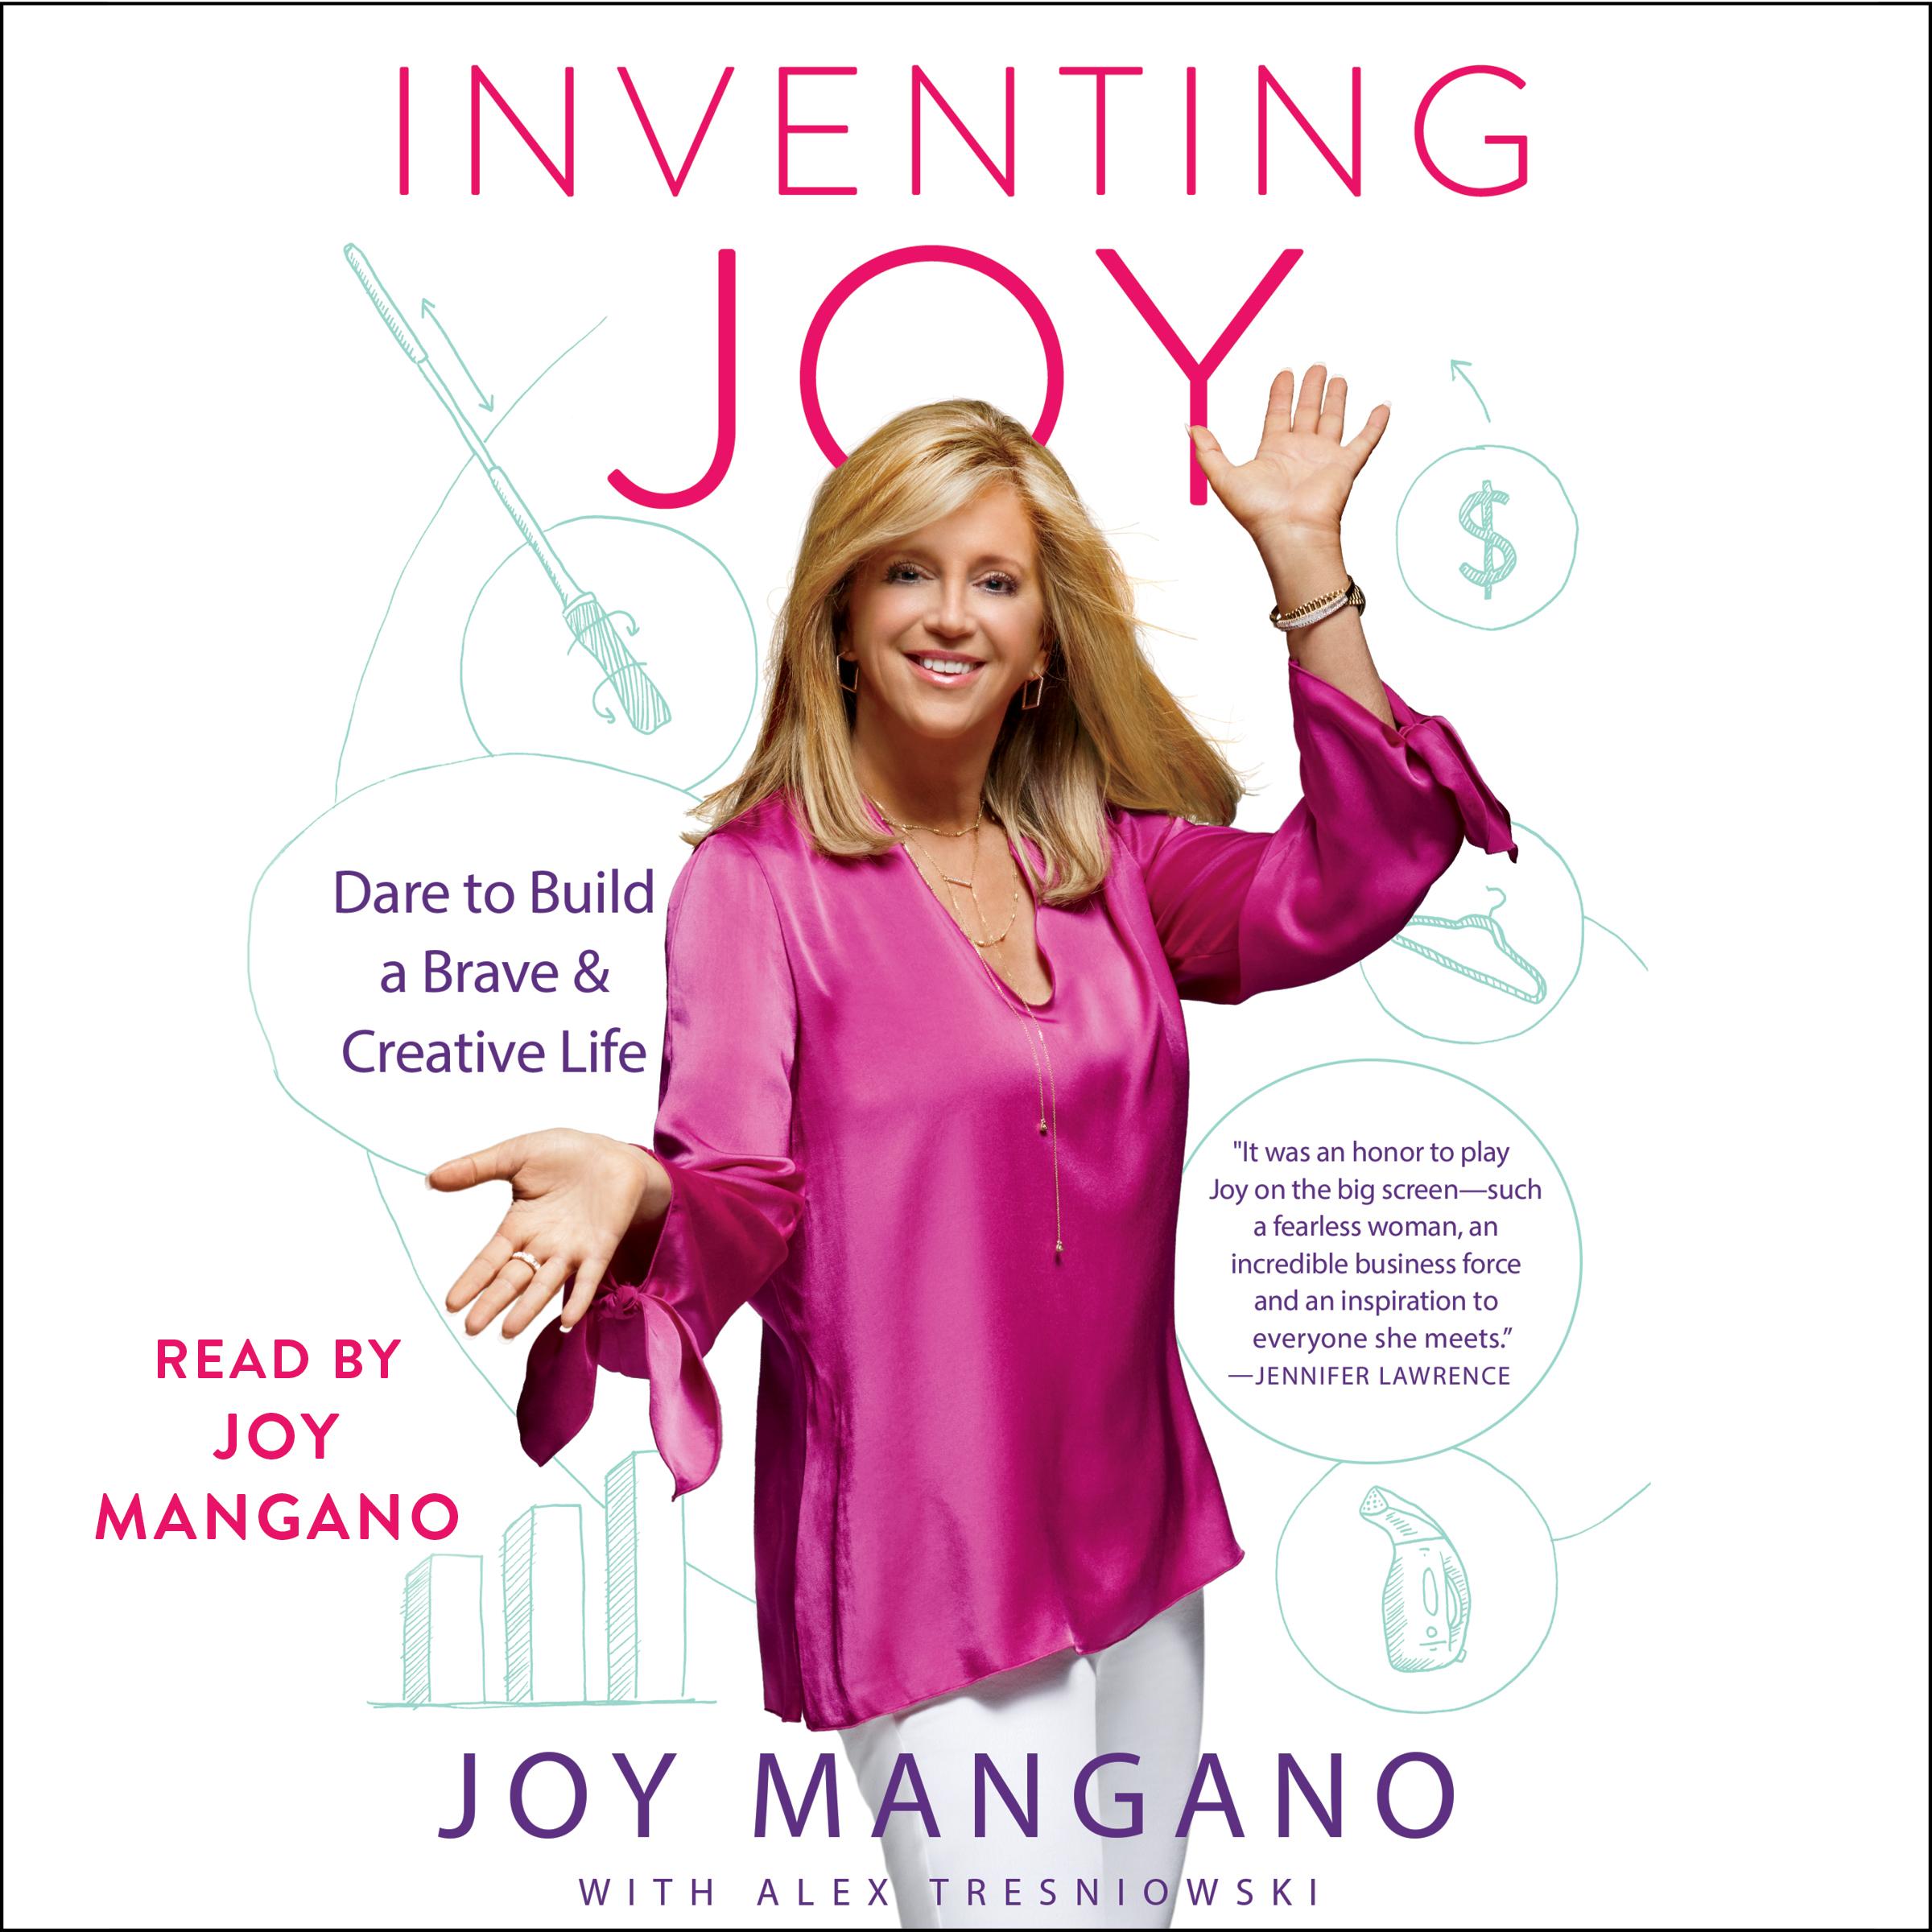 Inventing joy 9781508240136 hr